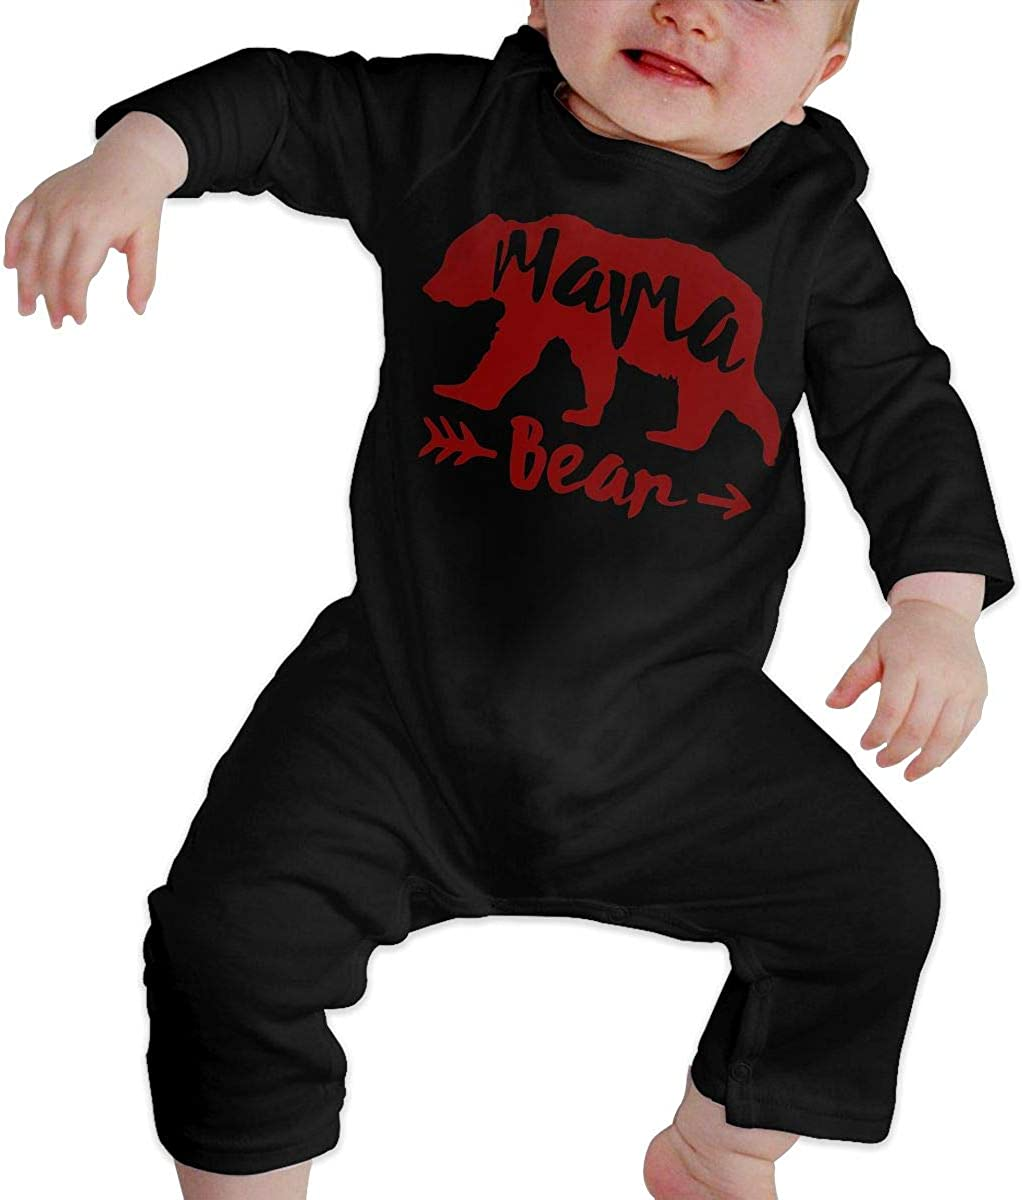 Mama Bear-2 Printed Newborn Infant Baby Boy Girl One-Piece Suit Long Sleeve Pajamas Black